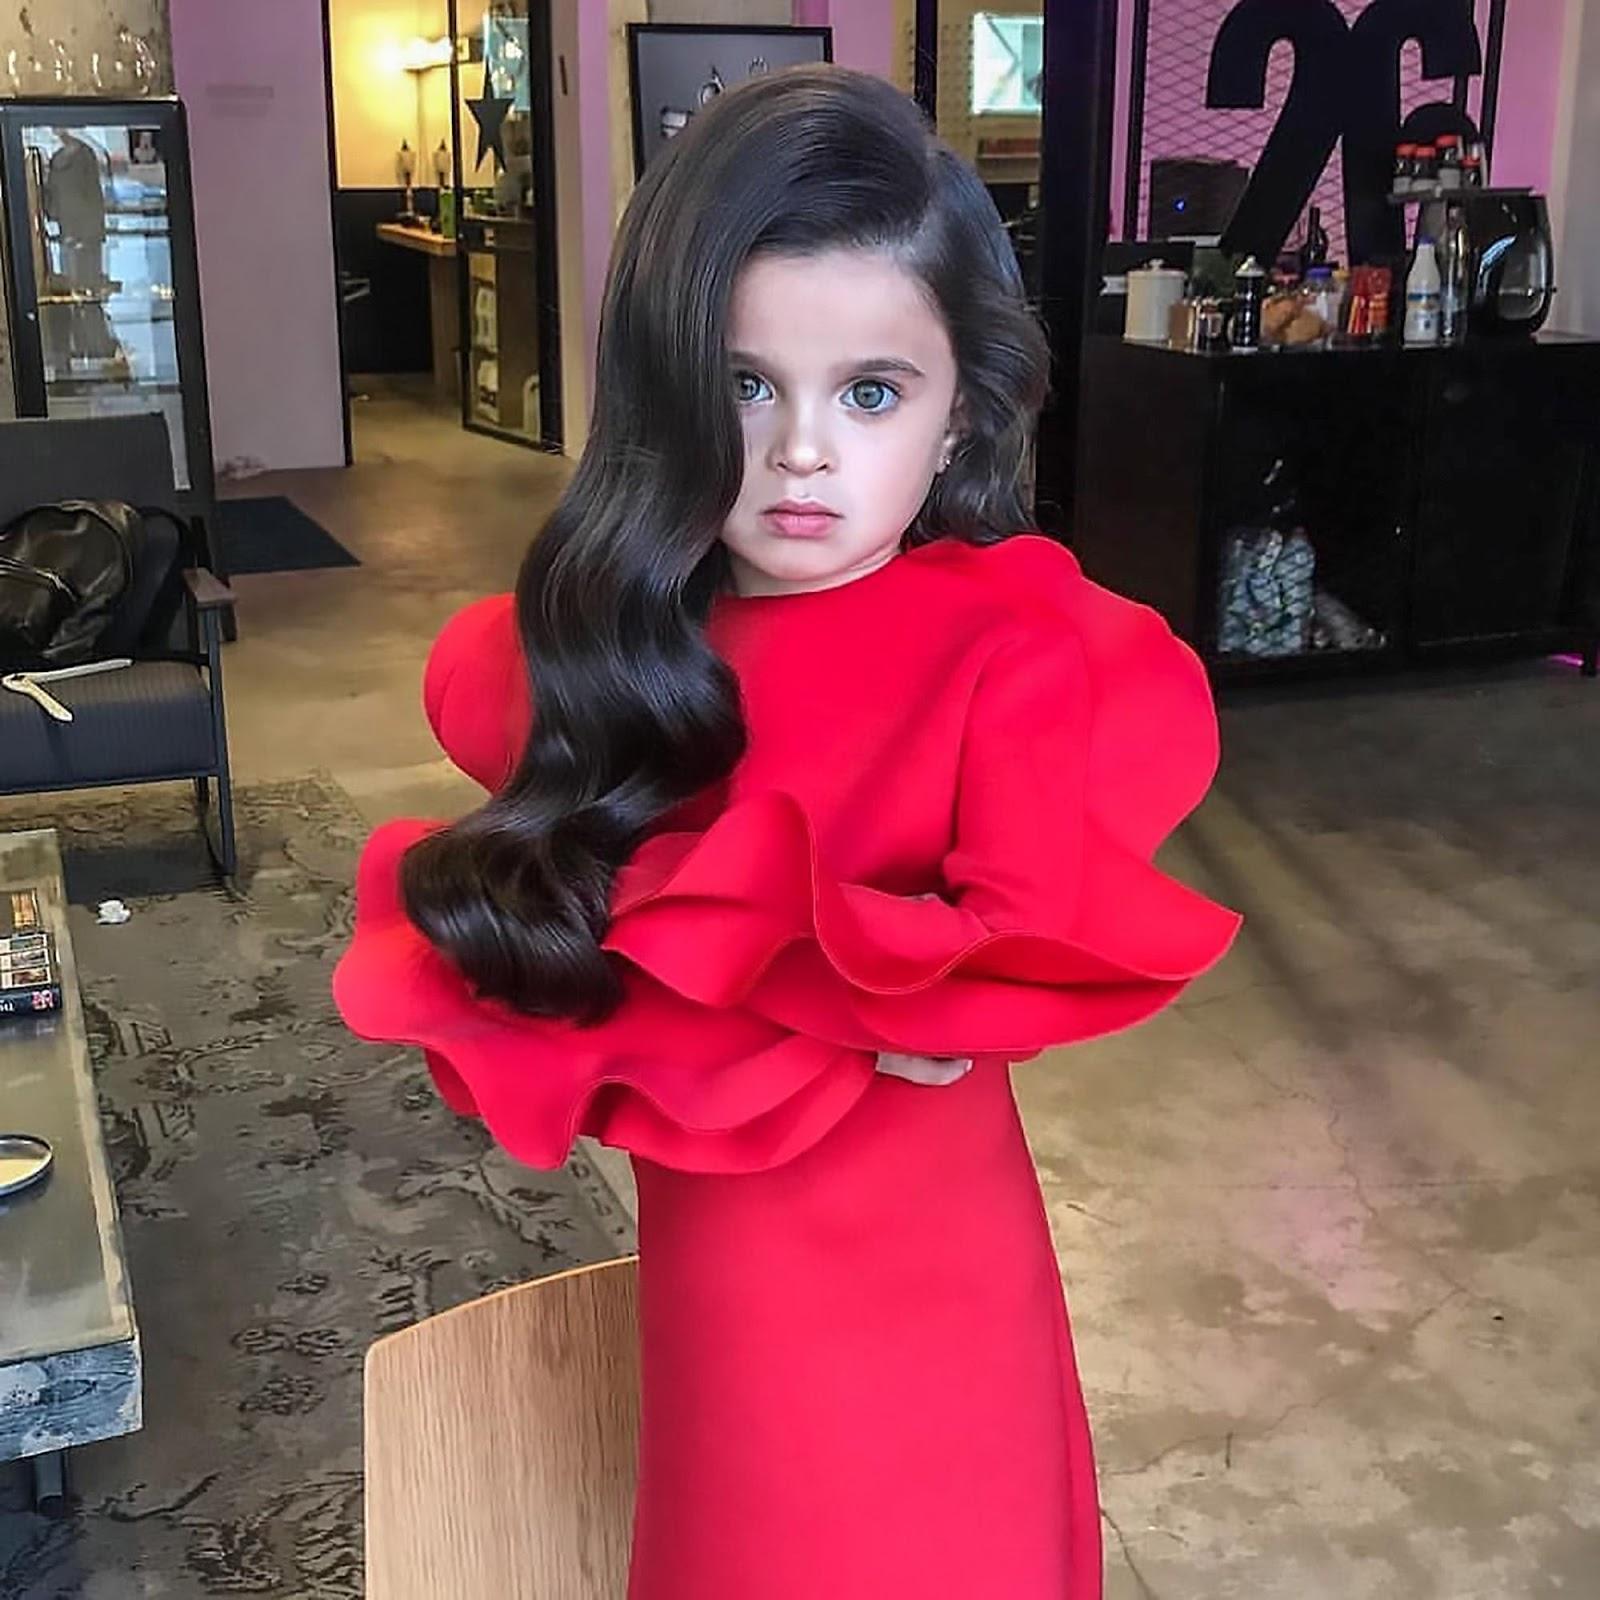 Images for Girls Girls red dress ,صور للفتيات فستان أحمر,Girls, fotos, Foto, Foto Girls, صور, صور بنات,Images